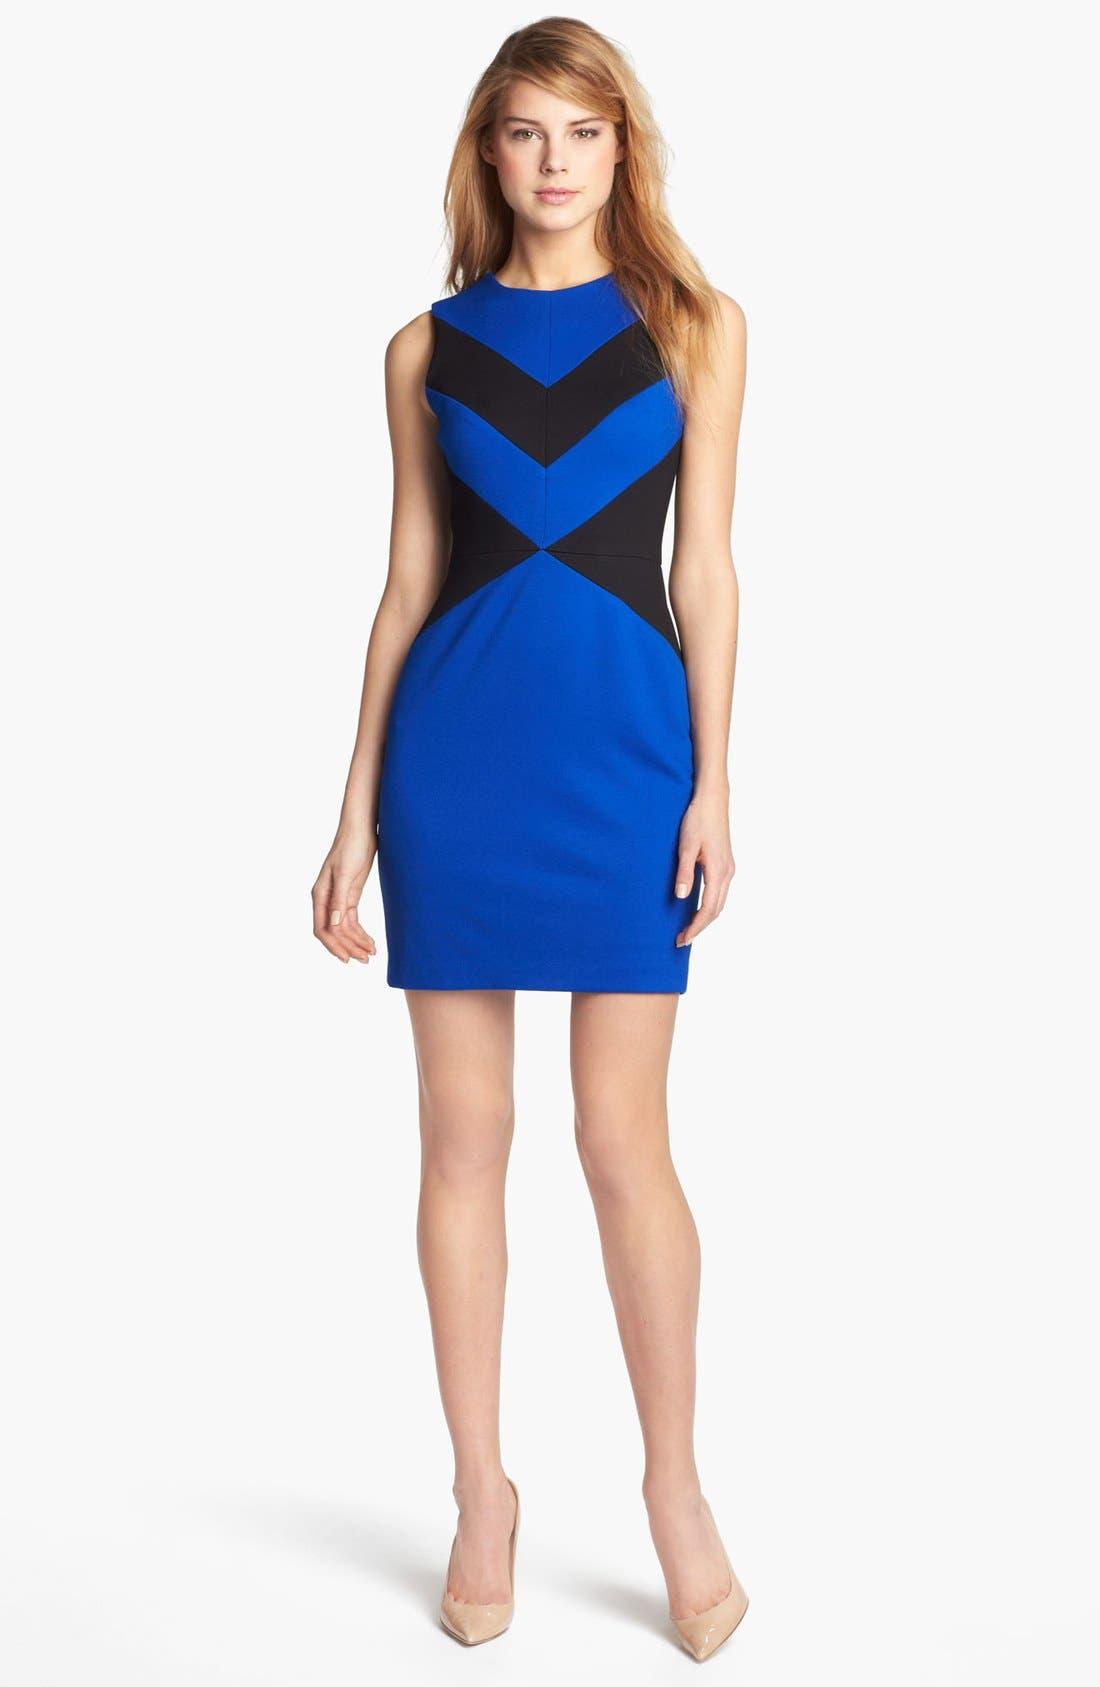 Alternate Image 1 Selected - Cynthia Steffe 'Elizabeth' Sleeveless Colorblock Sheath Dress